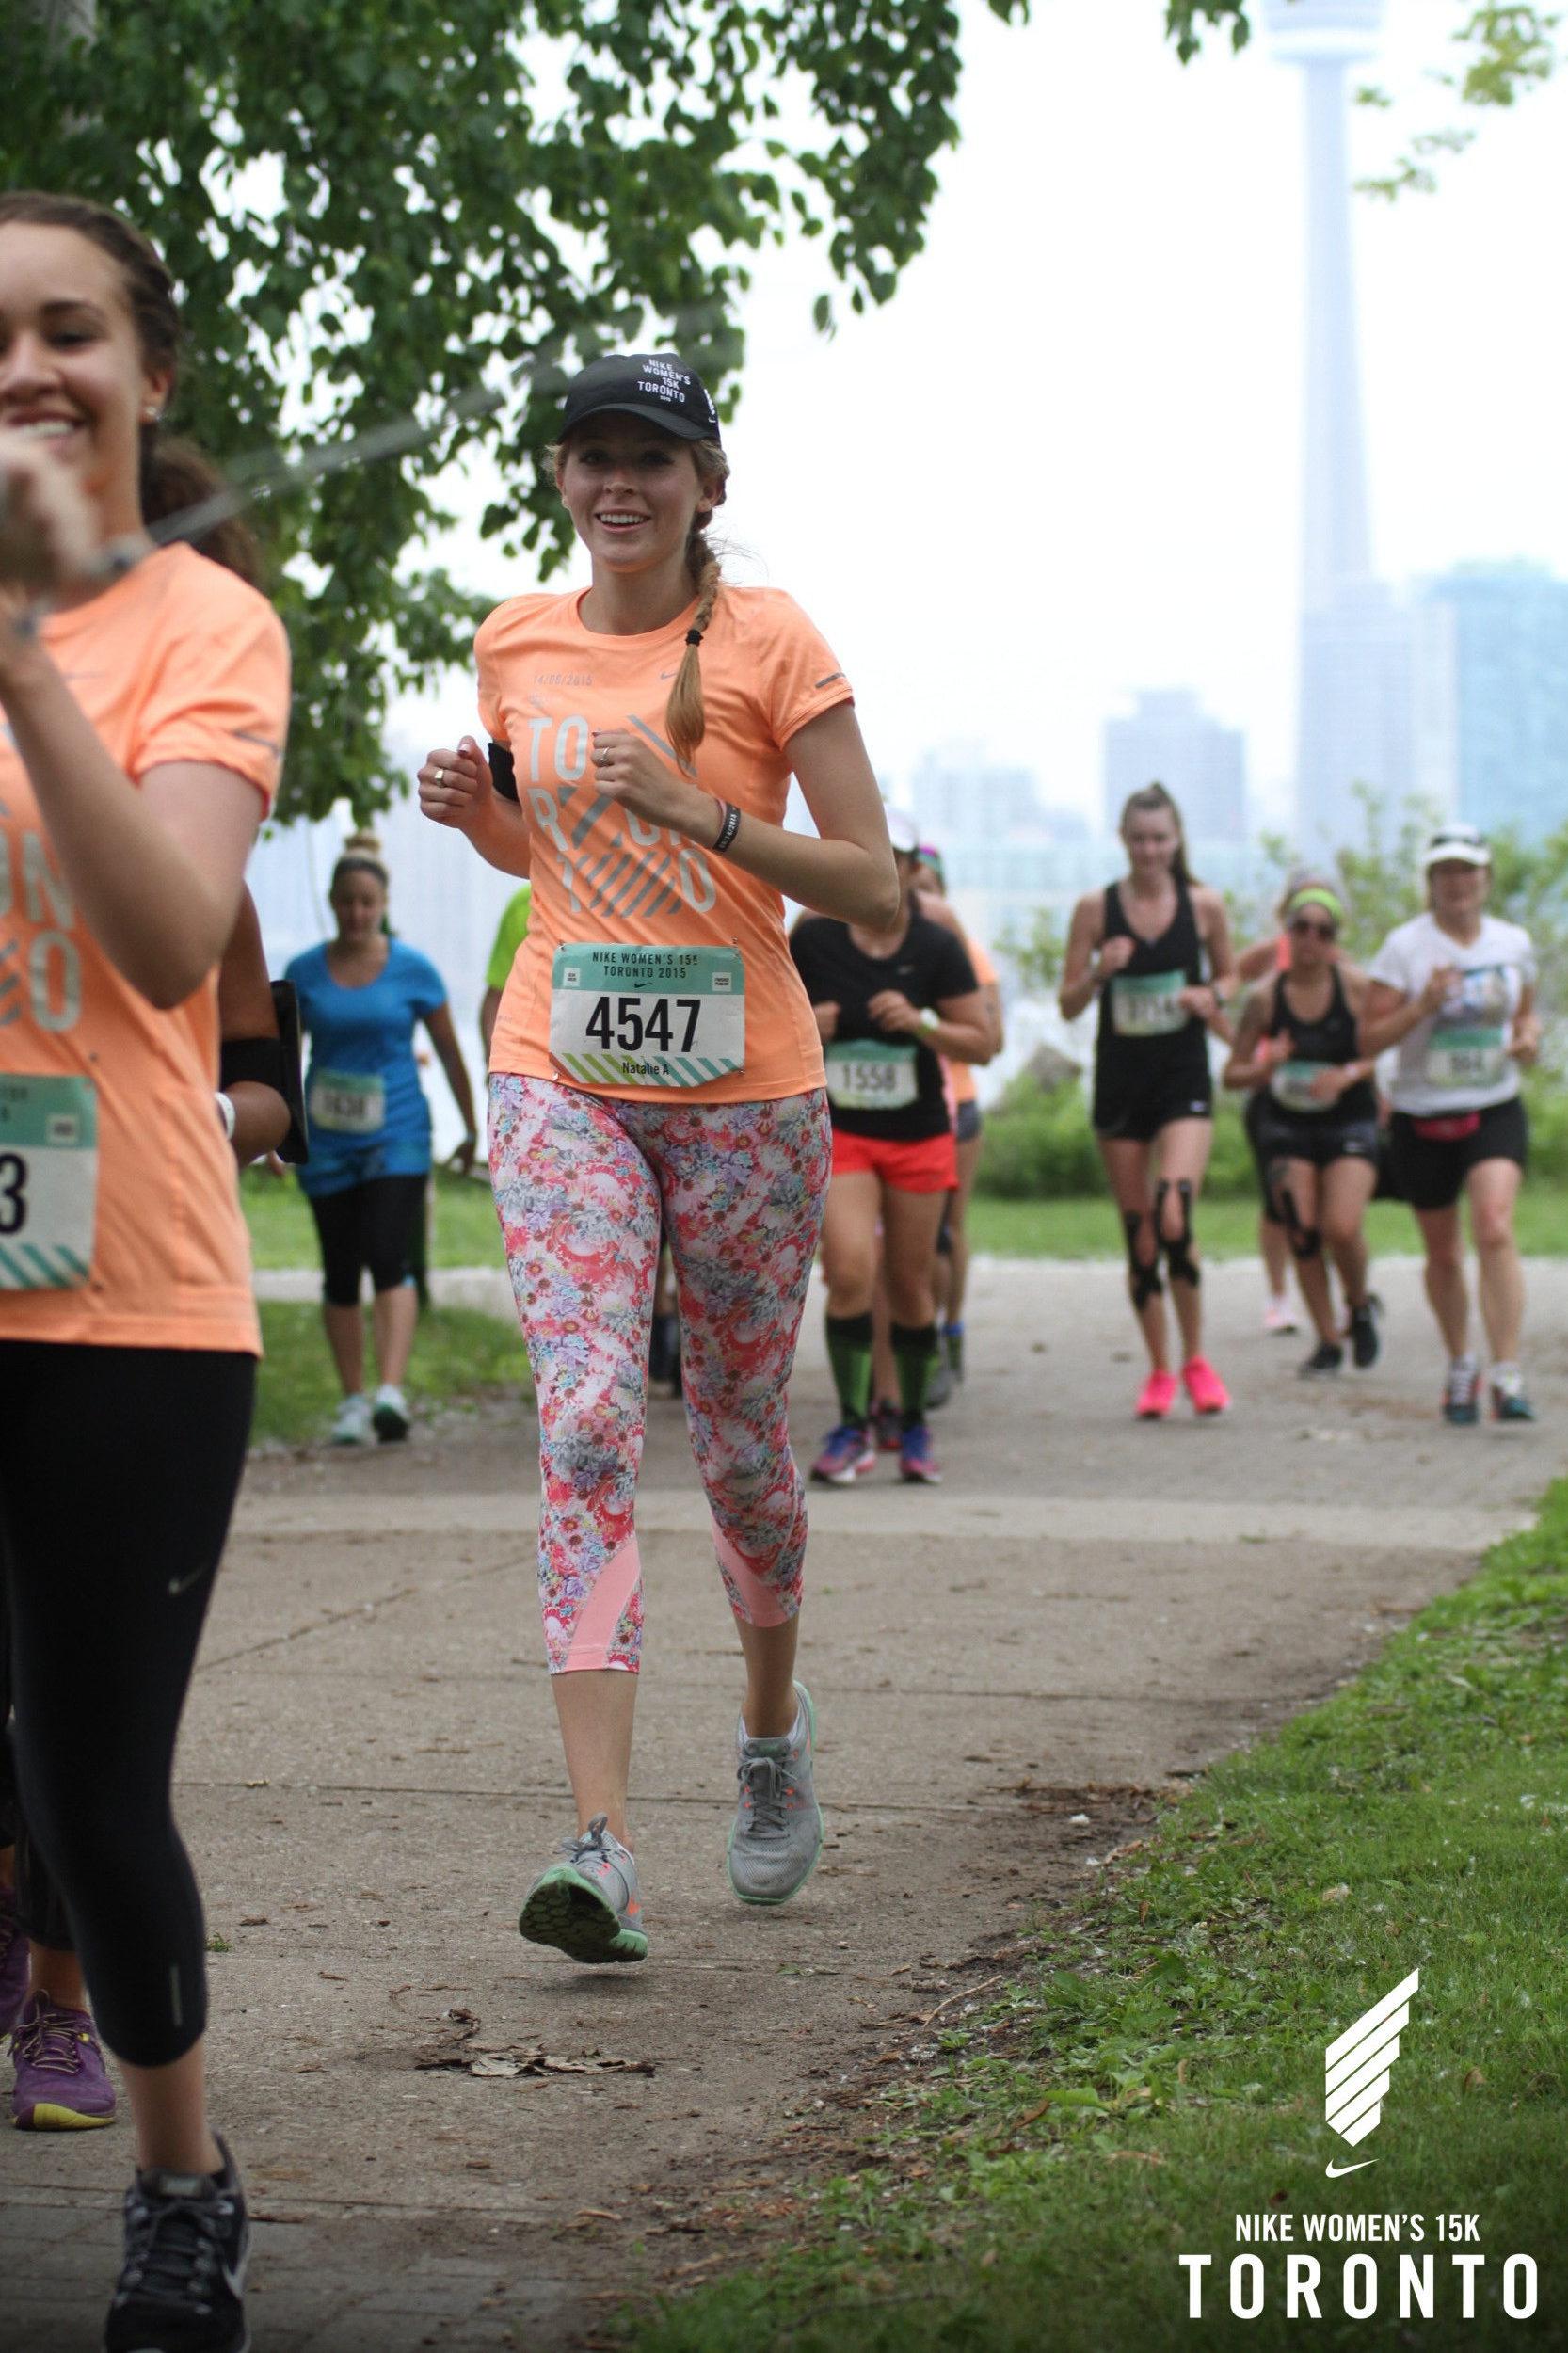 nike women's 15k toronto race photo